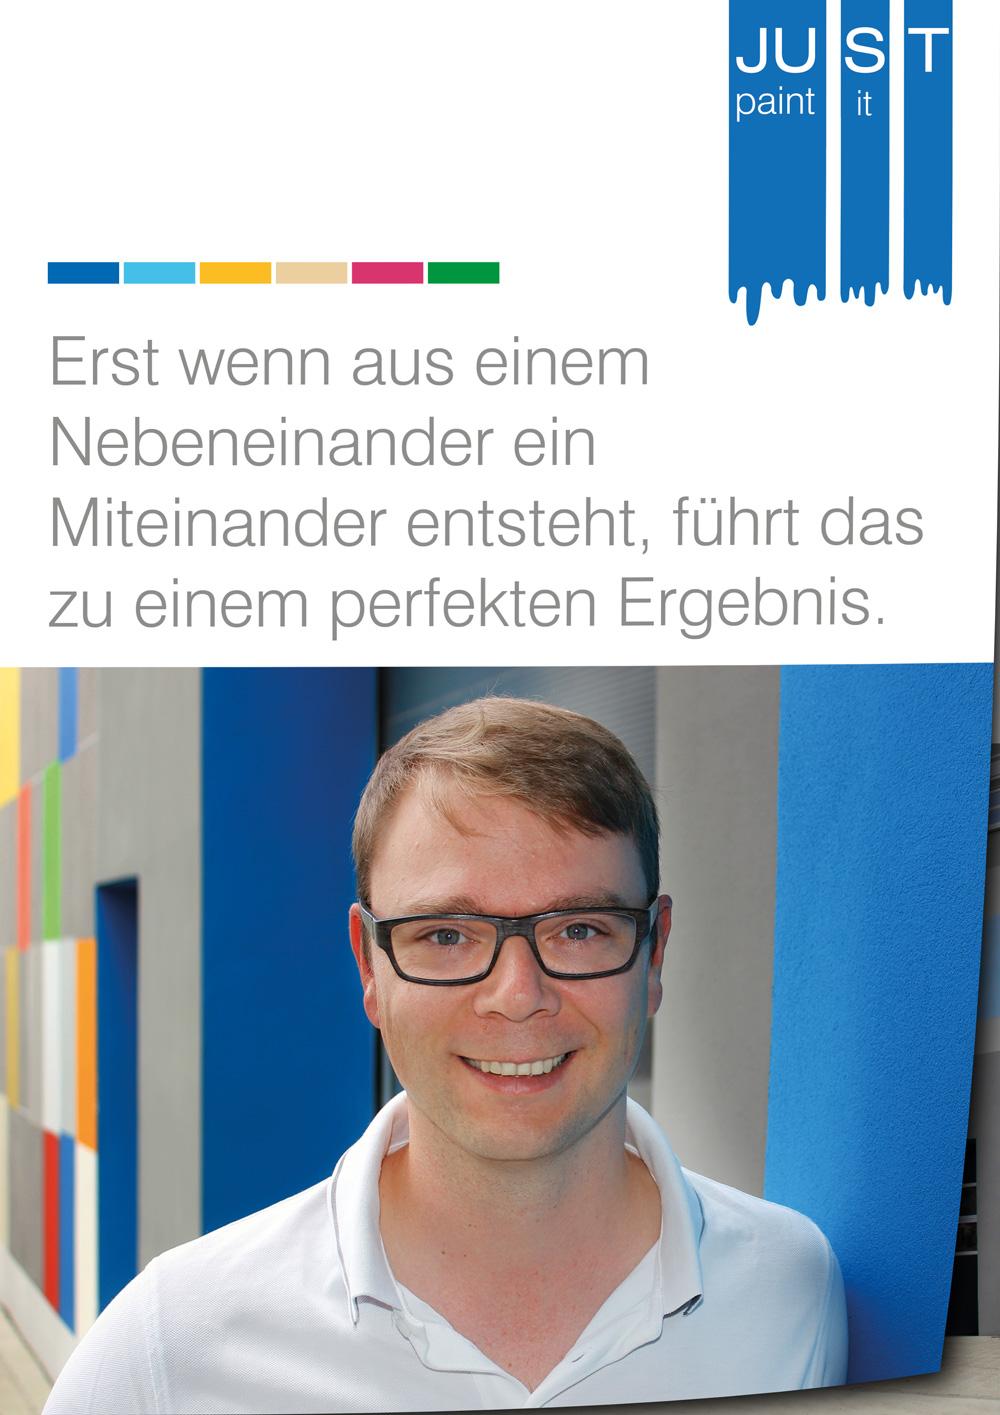 Imageprospekt JUST GmbH